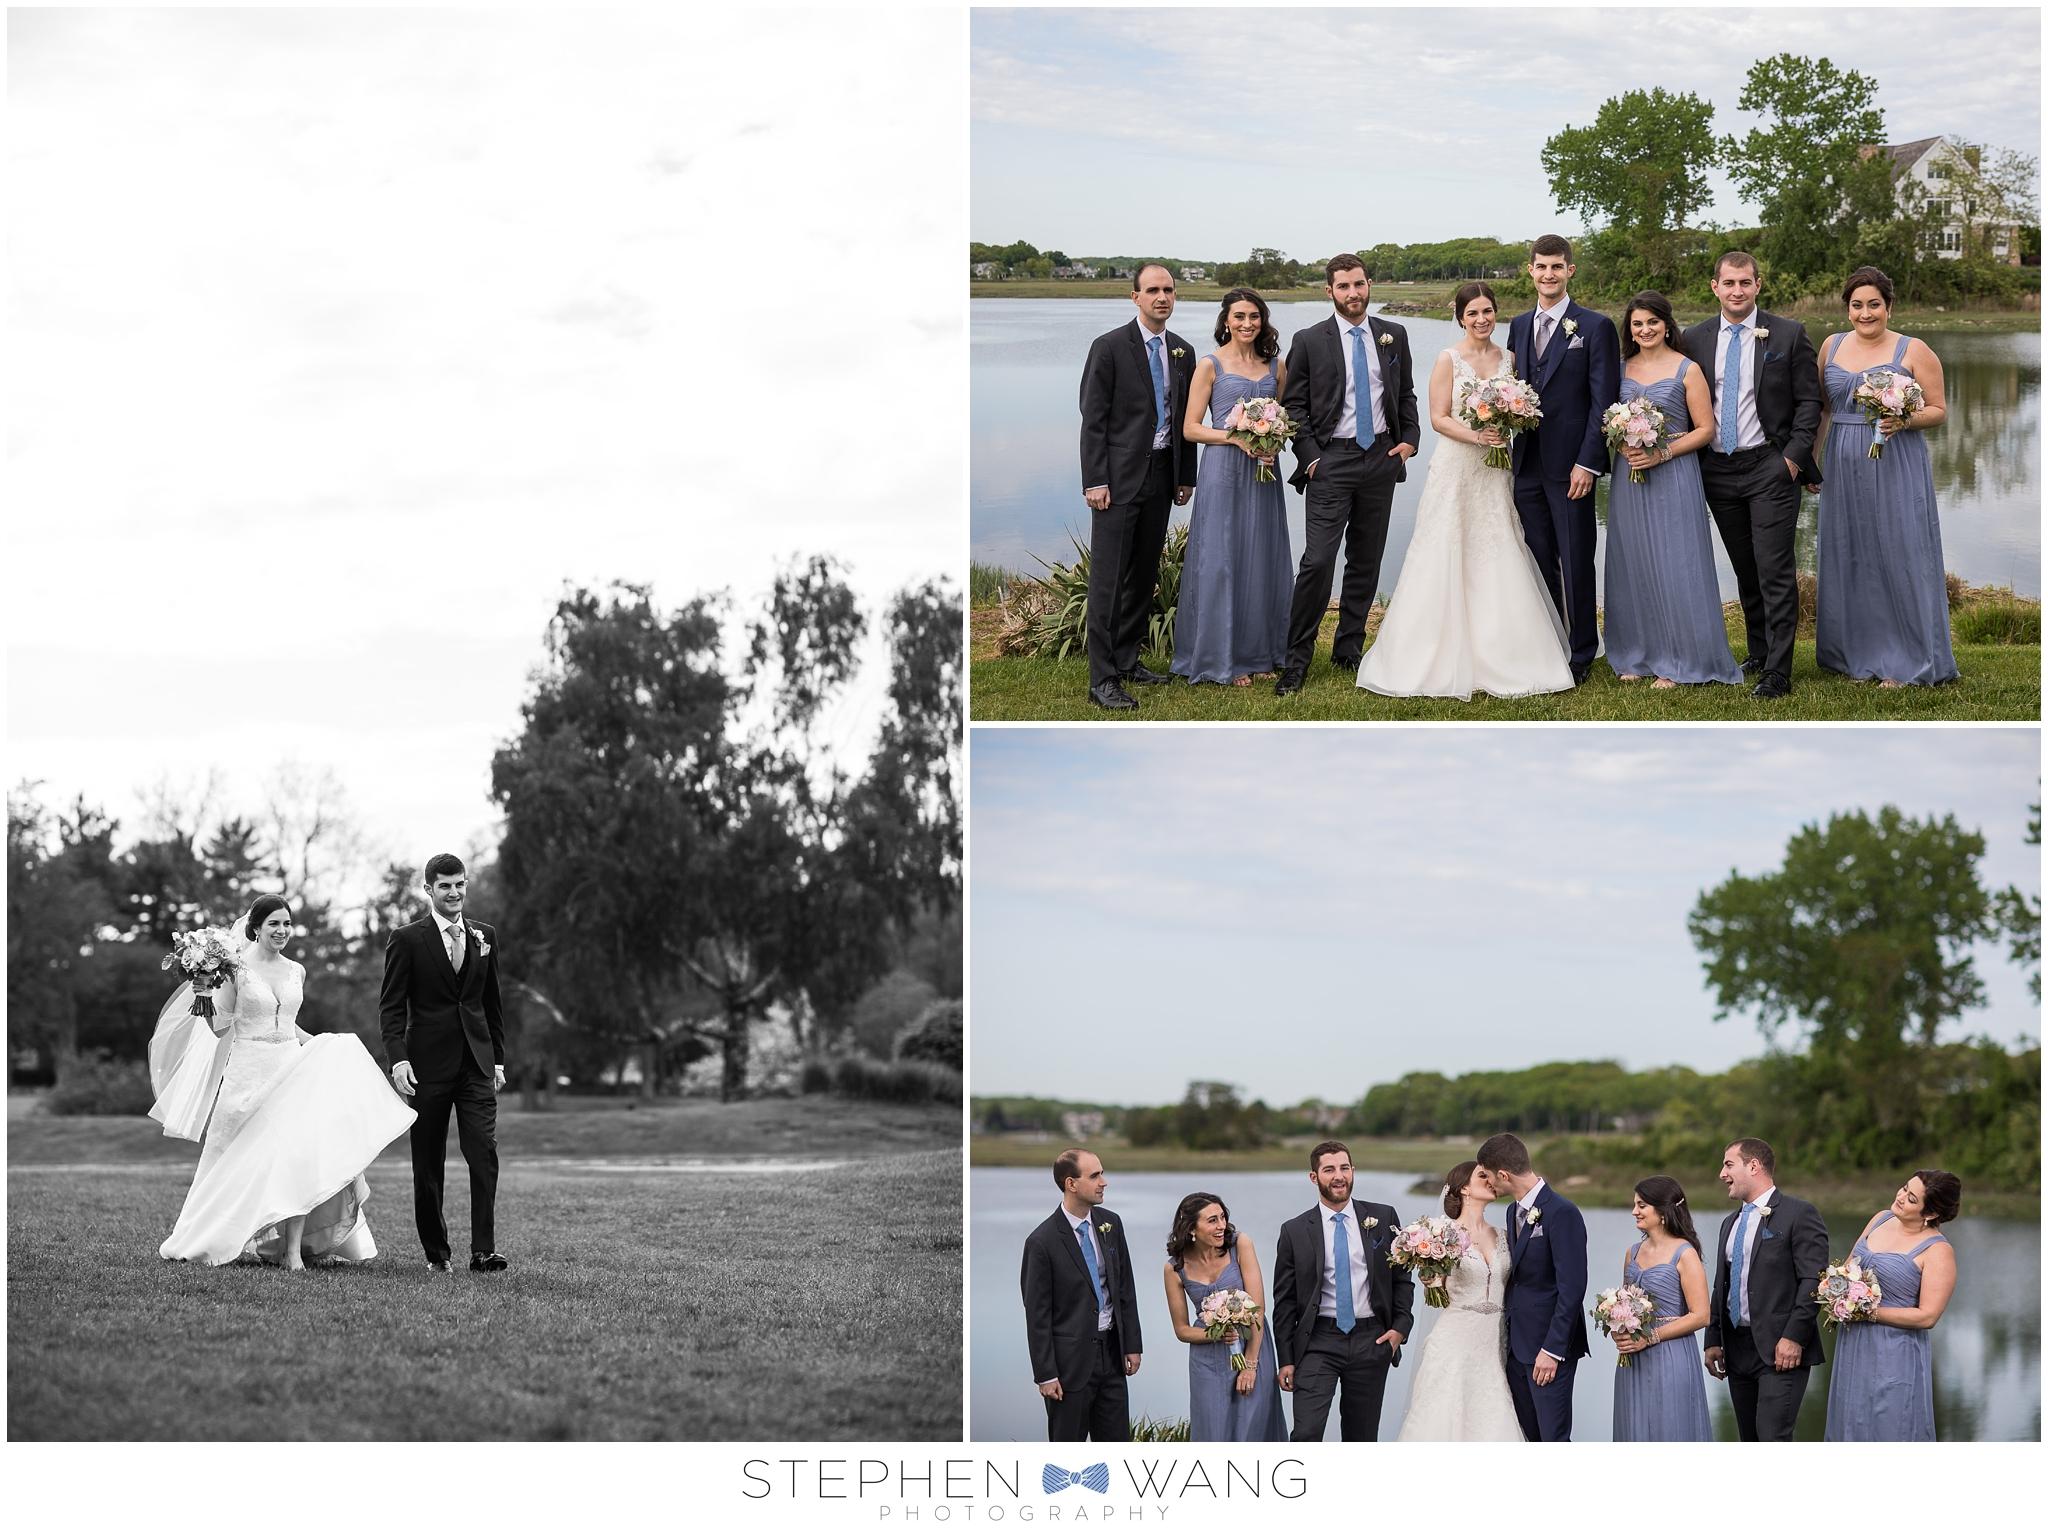 Stephen Wang Photography Shorehaven Norwalk CT Wedding Photographer connecticut shoreline shore haven - 22.jpg